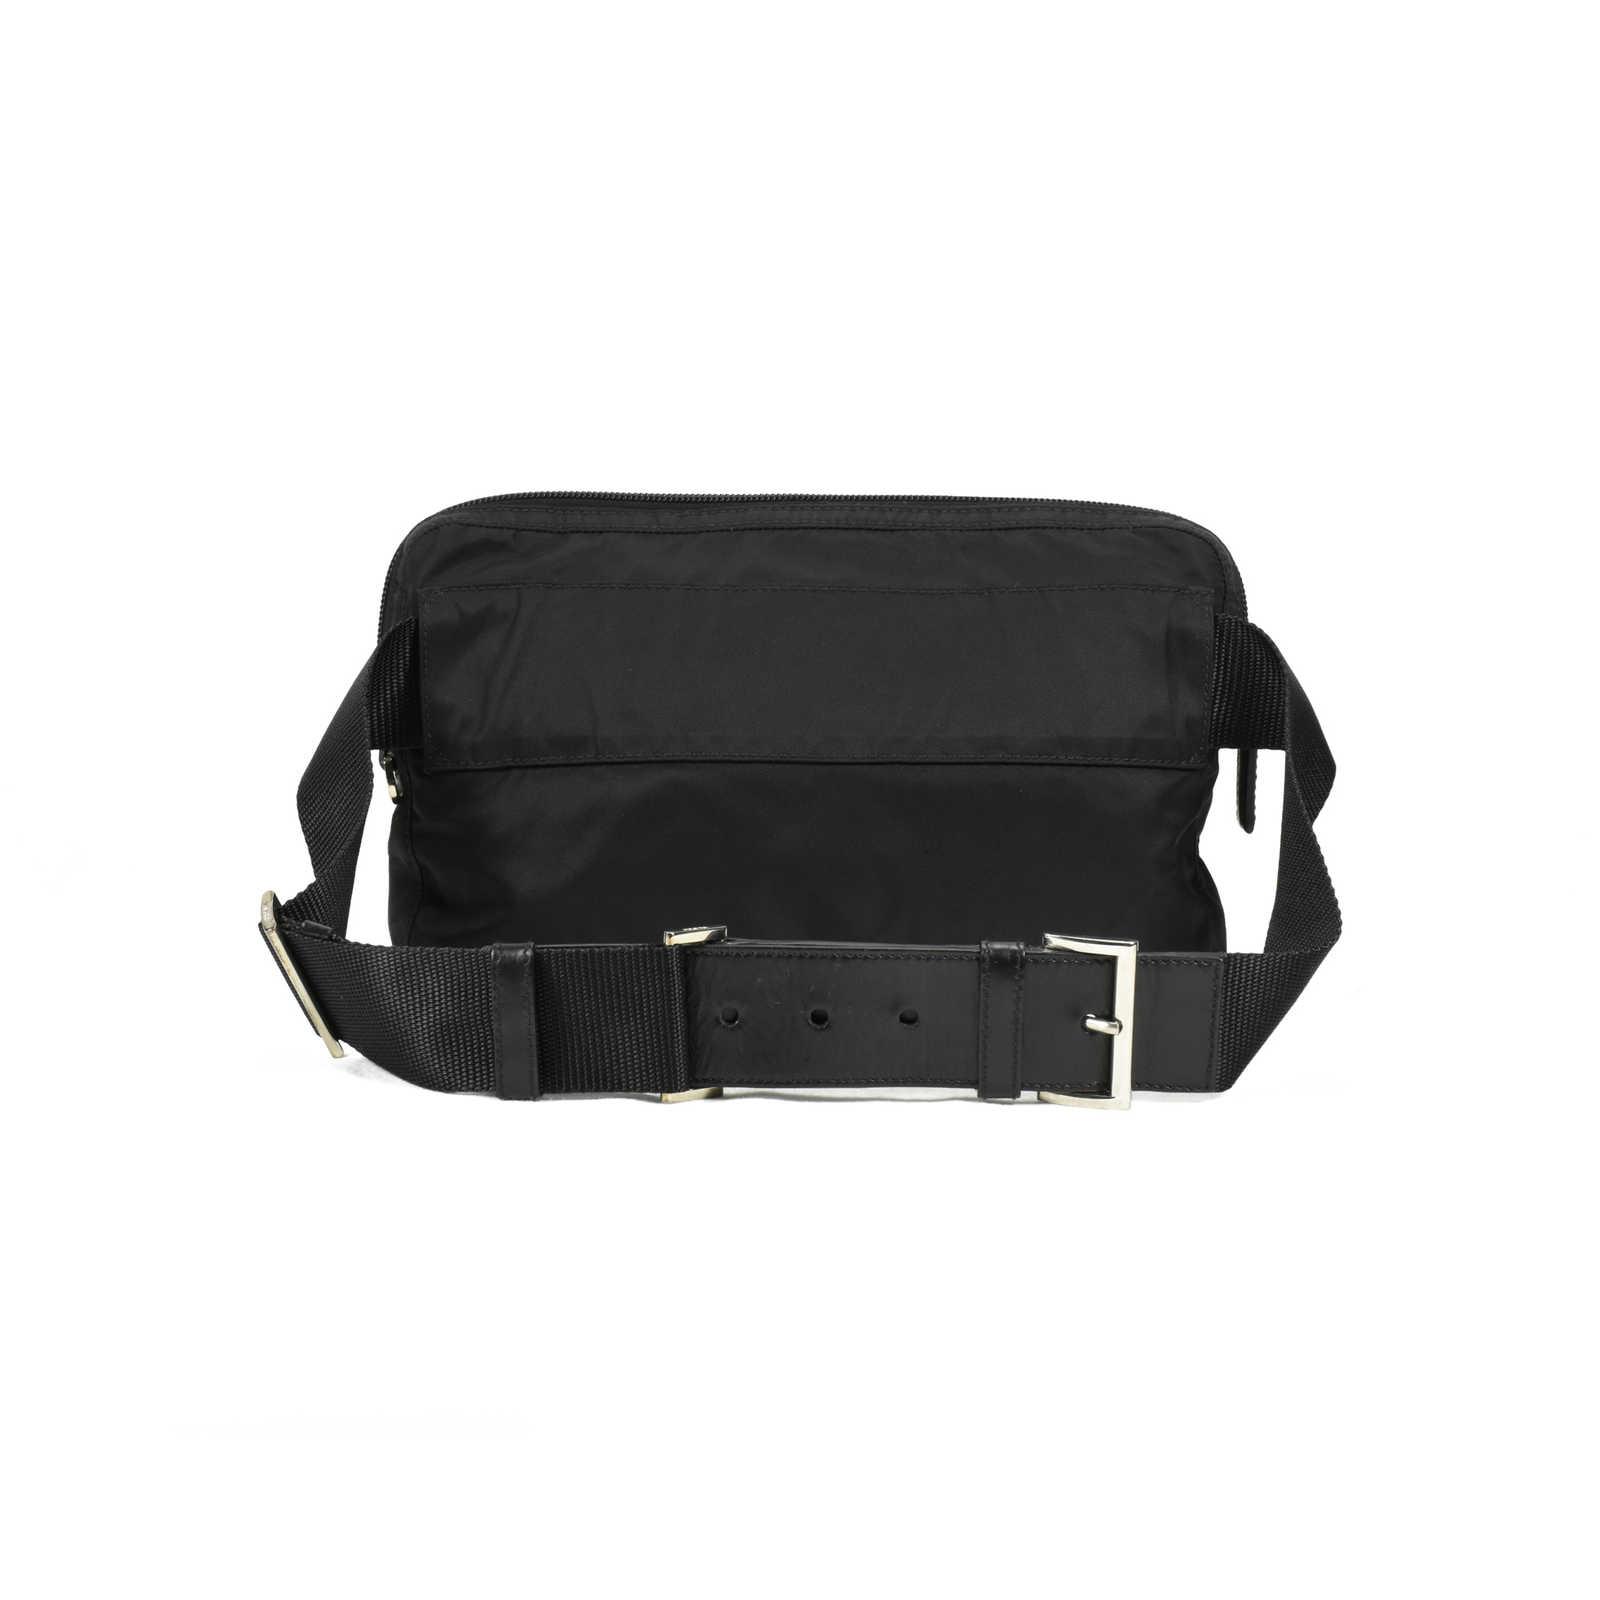 ... Authentic Second Hand Prada Nylon Belt Bag (PSS-200-00892) - Thumbnail  ... d00d5a09ffcc4